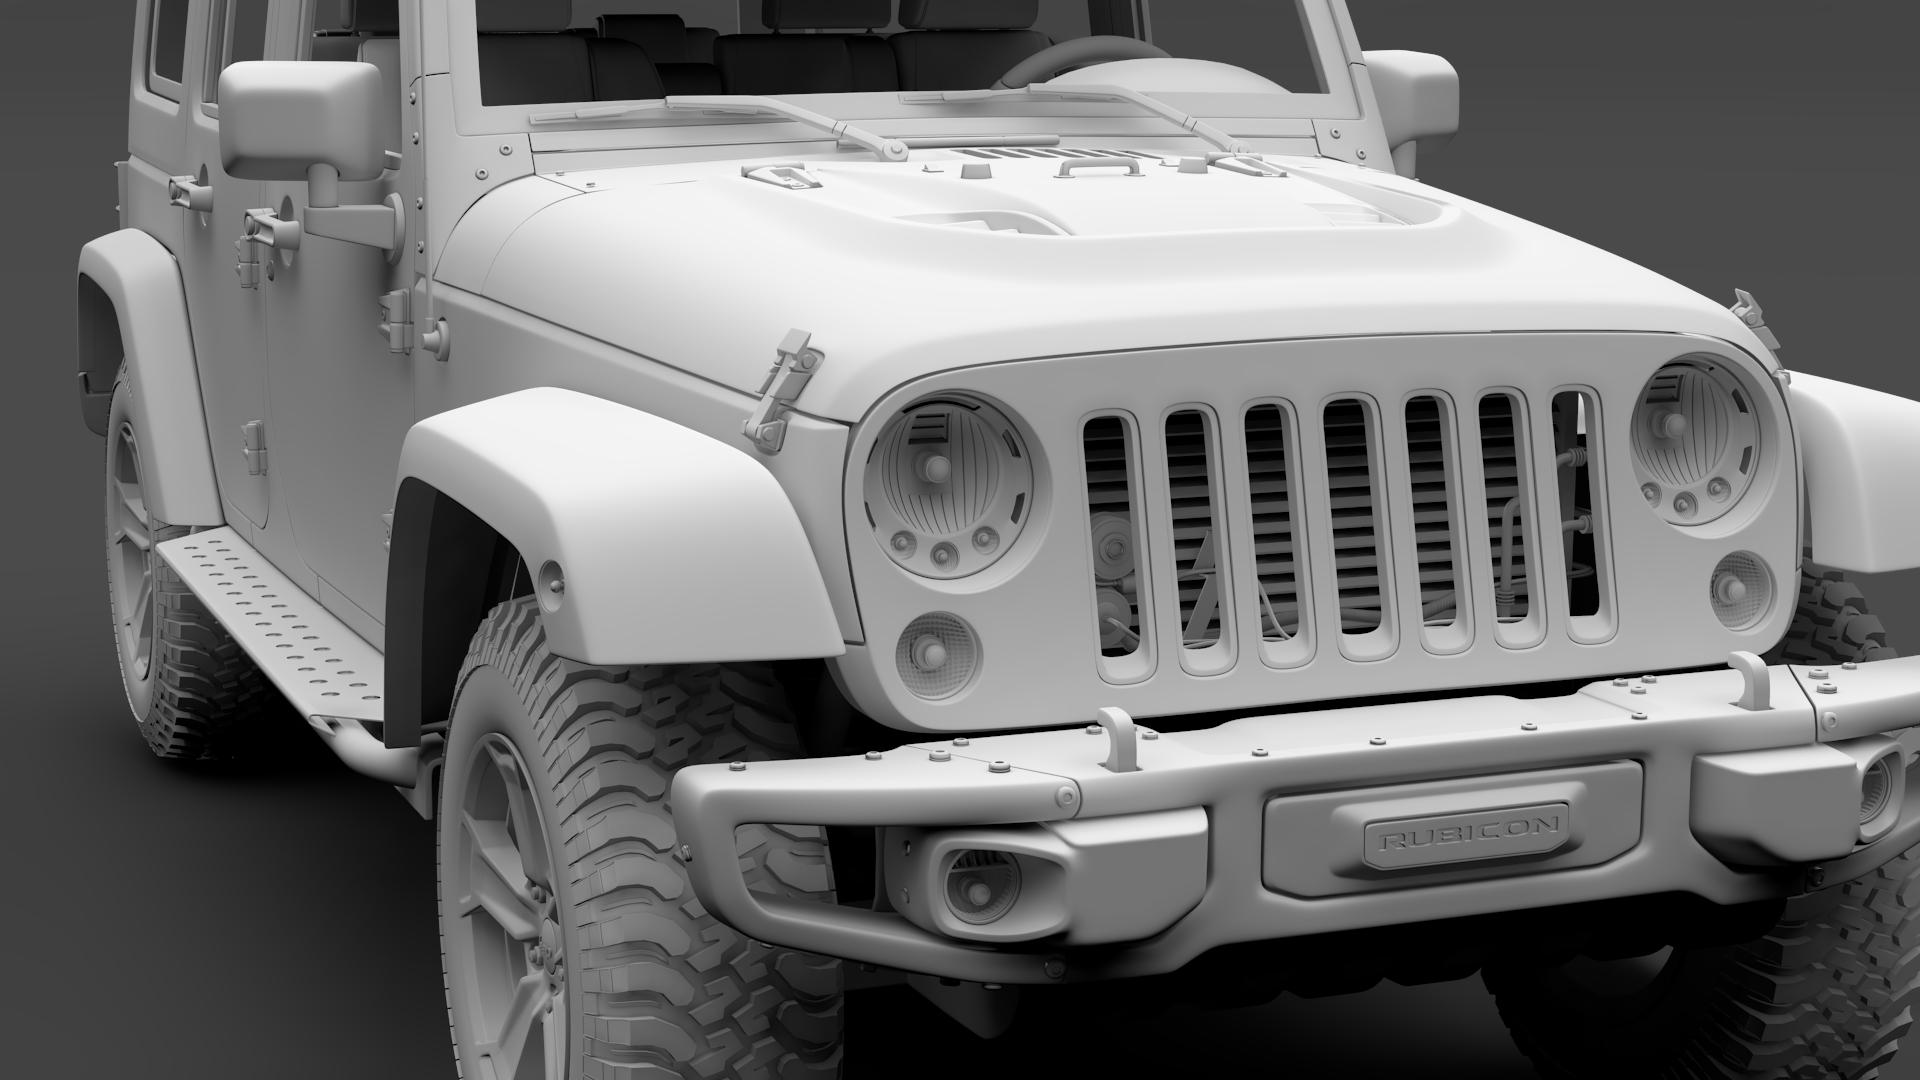 jeep wrangler unlimited rubicon recon jk 2017 3d model max fbx c4d lwo ma mb hrc xsi obj 277015